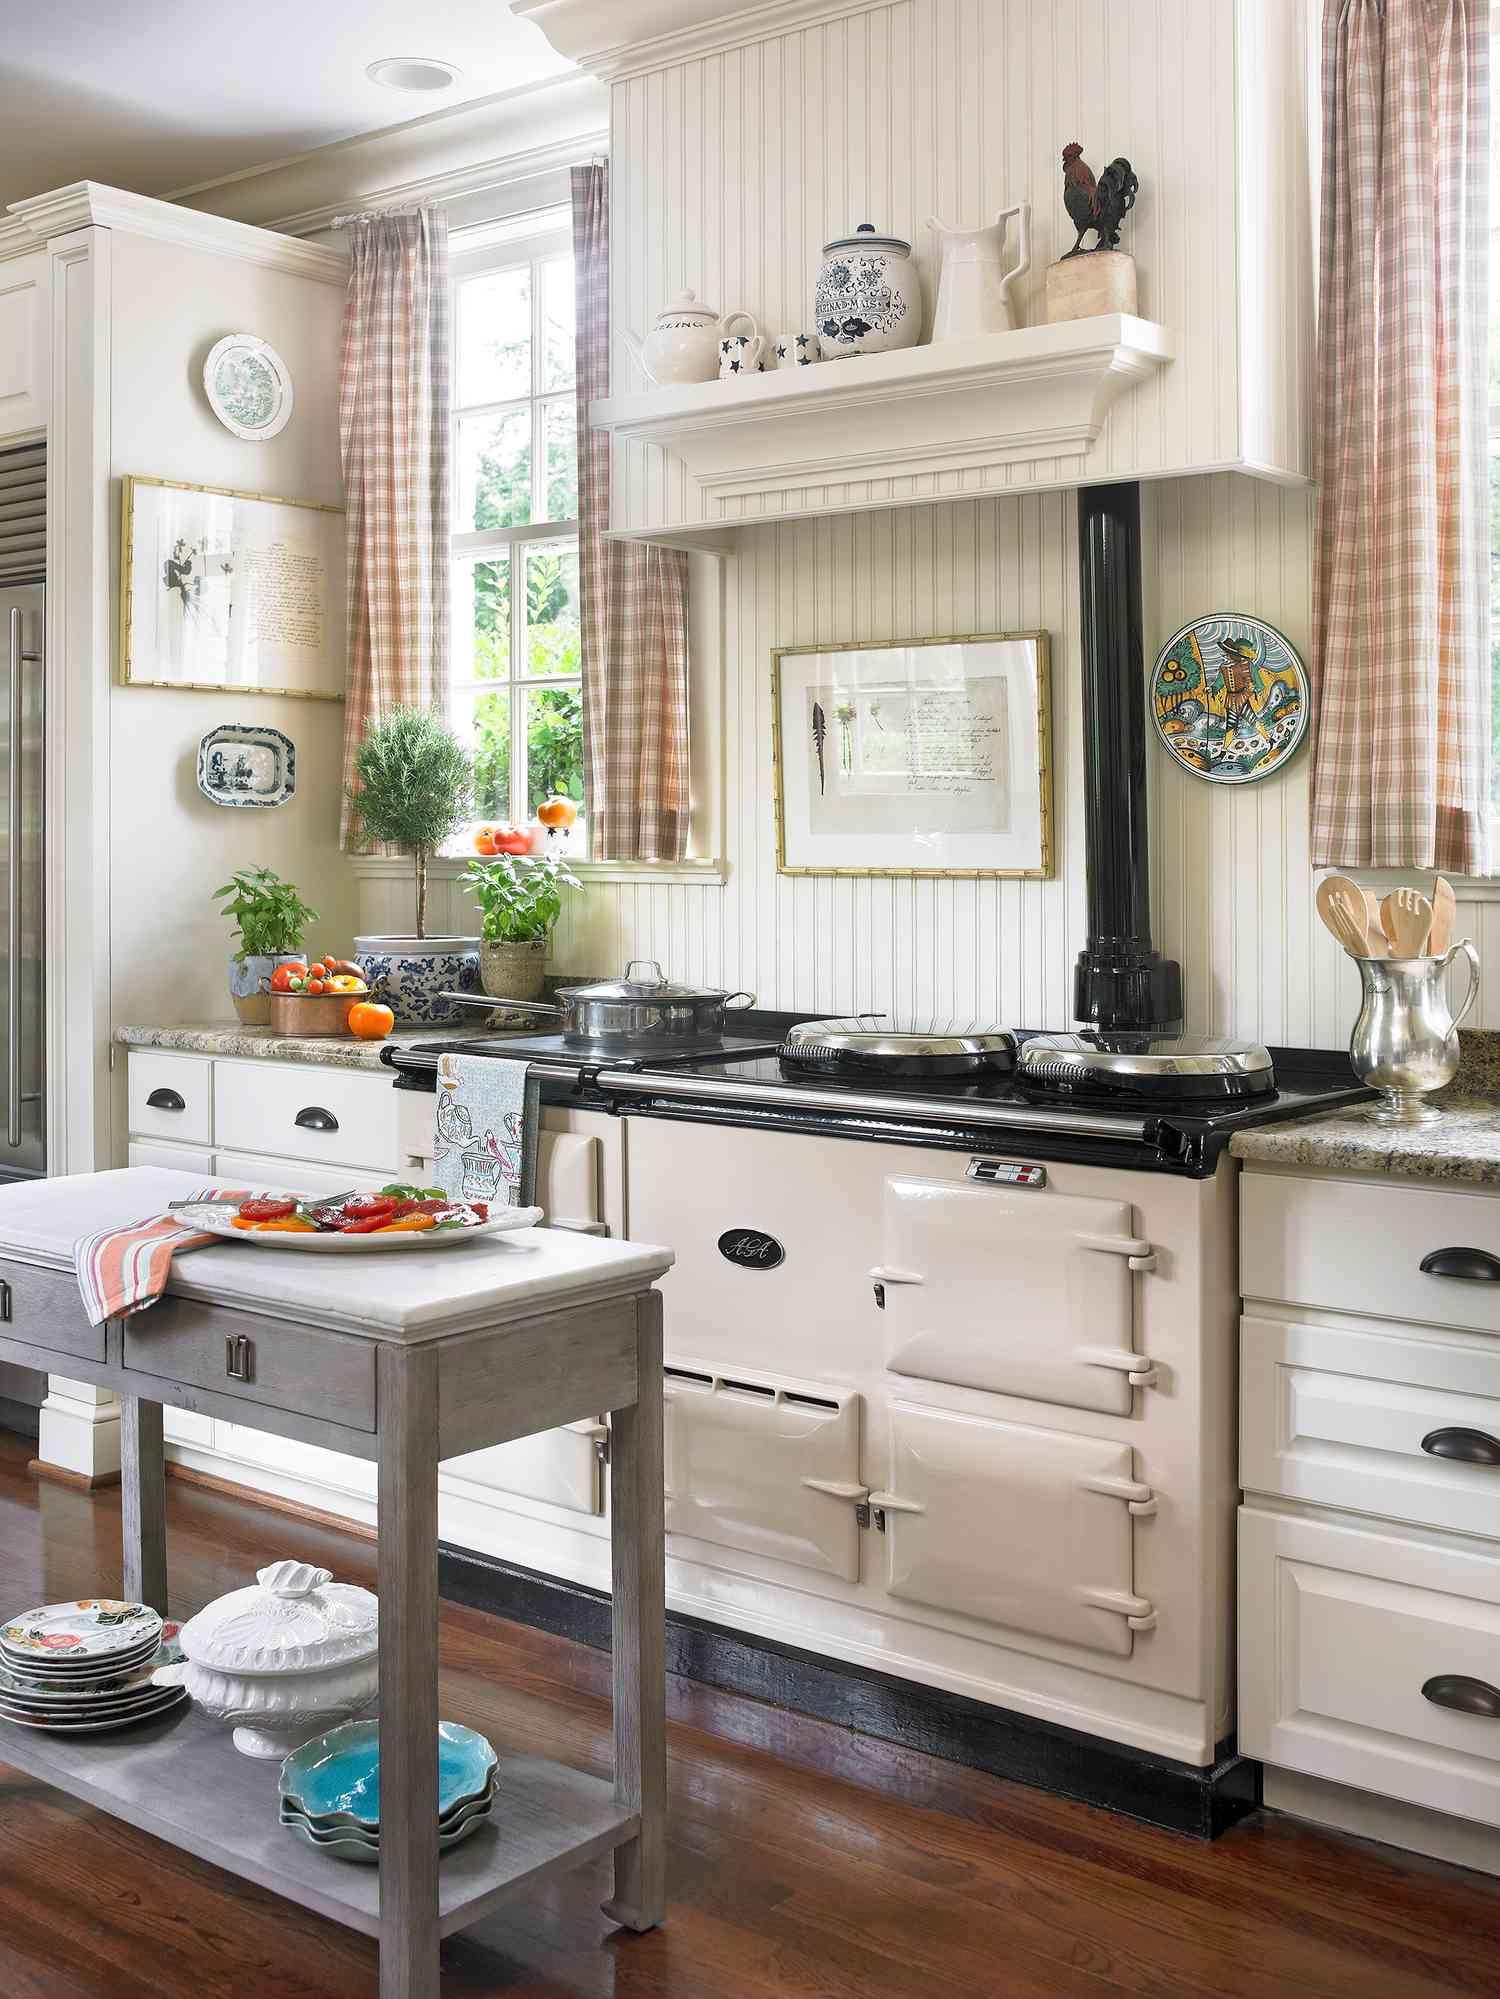 Rustic Window Treatment Ideas   Better Homes & Gardens on Farmhouse Curtain Ideas  id=86681